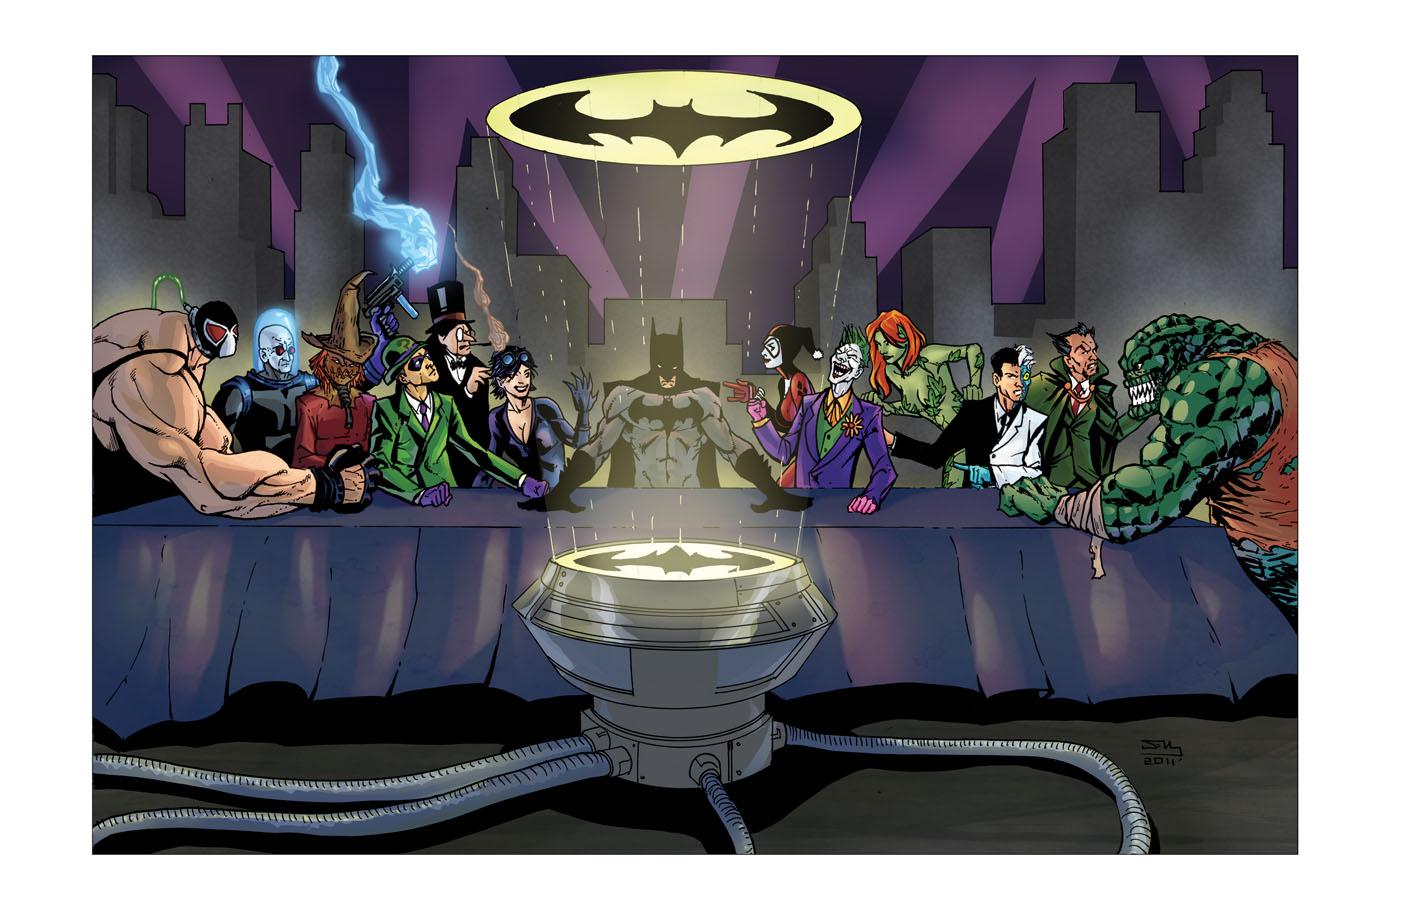 Last Supper of Gotham by thecreatorhd